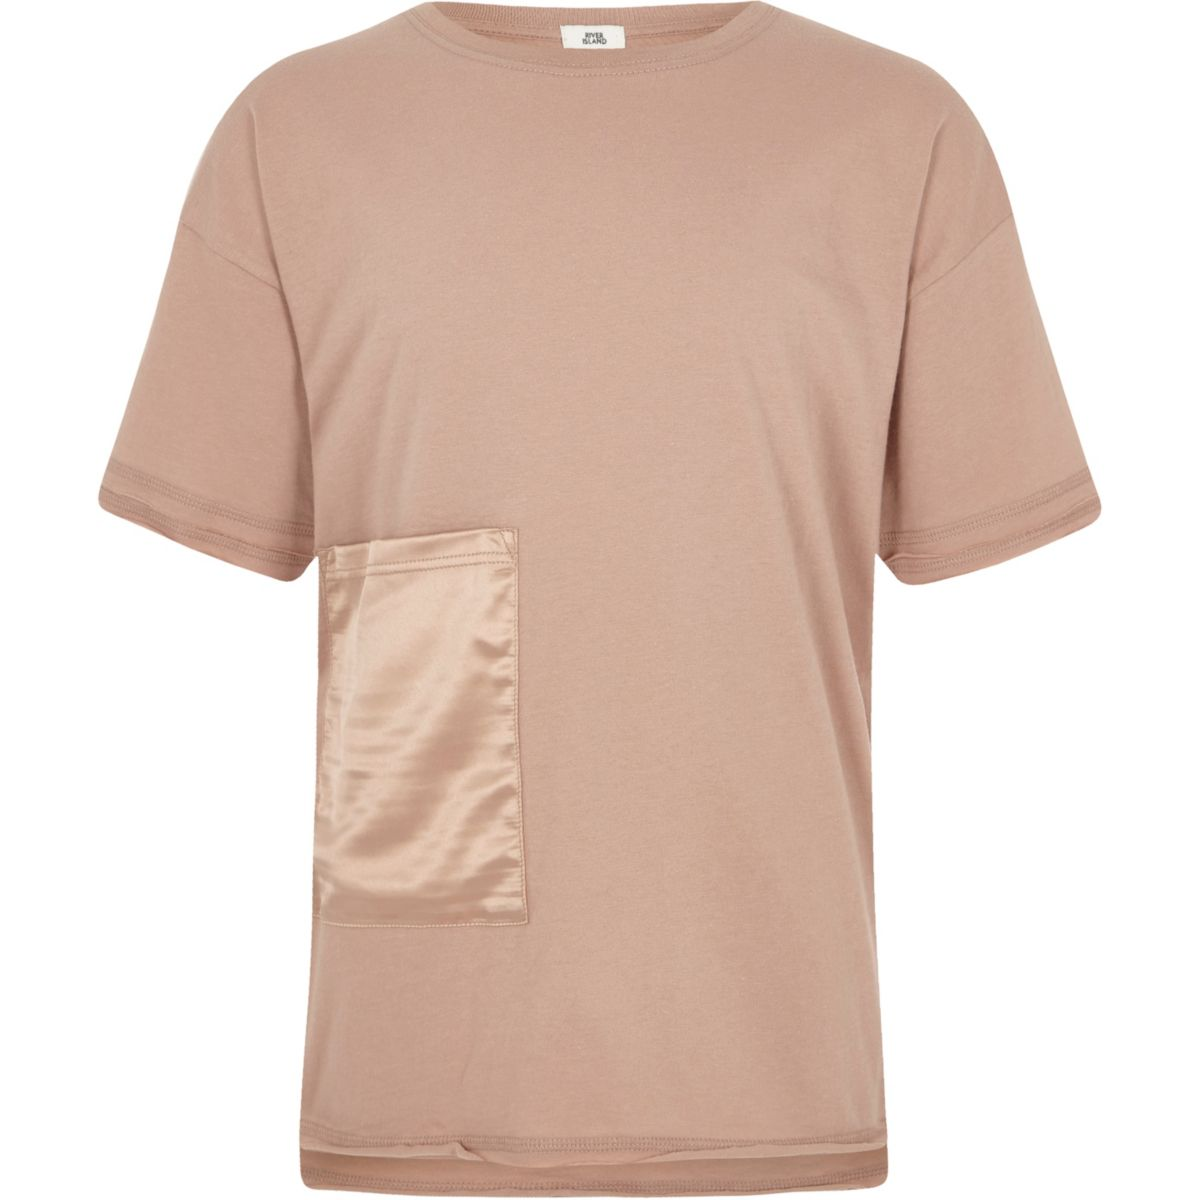 Girls beige satin pocket T-shirt